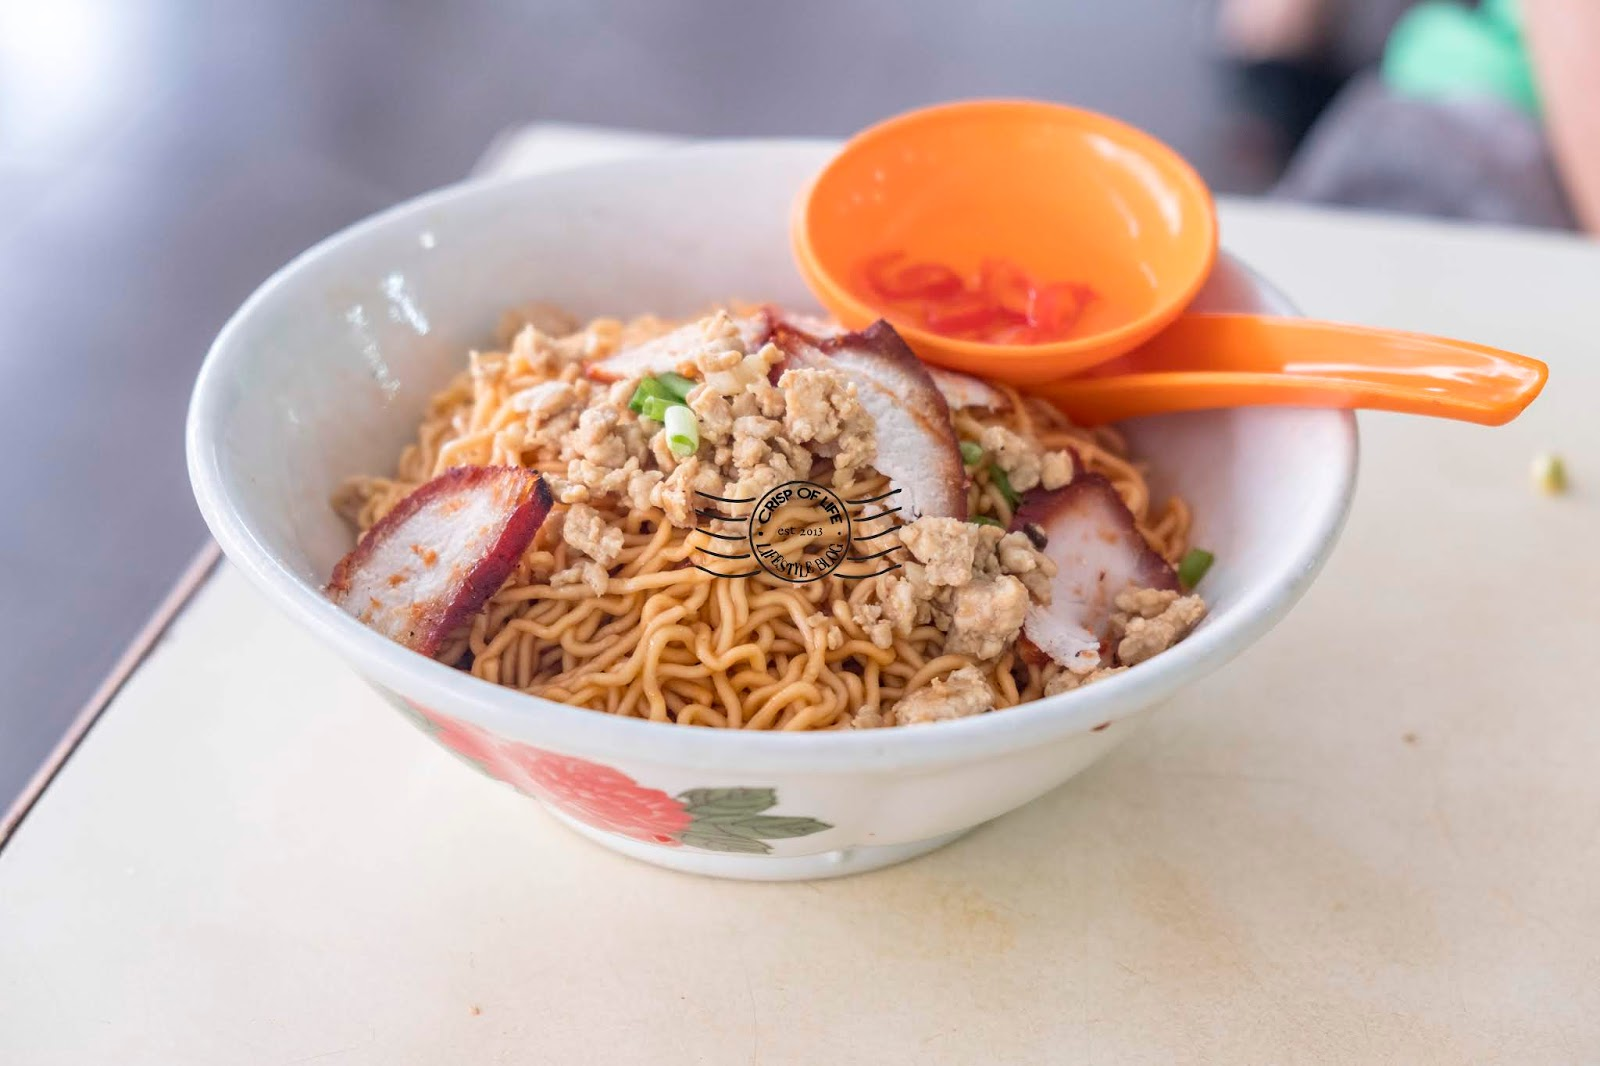 Sarawak Laksa @ Chong Choon Cafe, Kuching, Sarawak